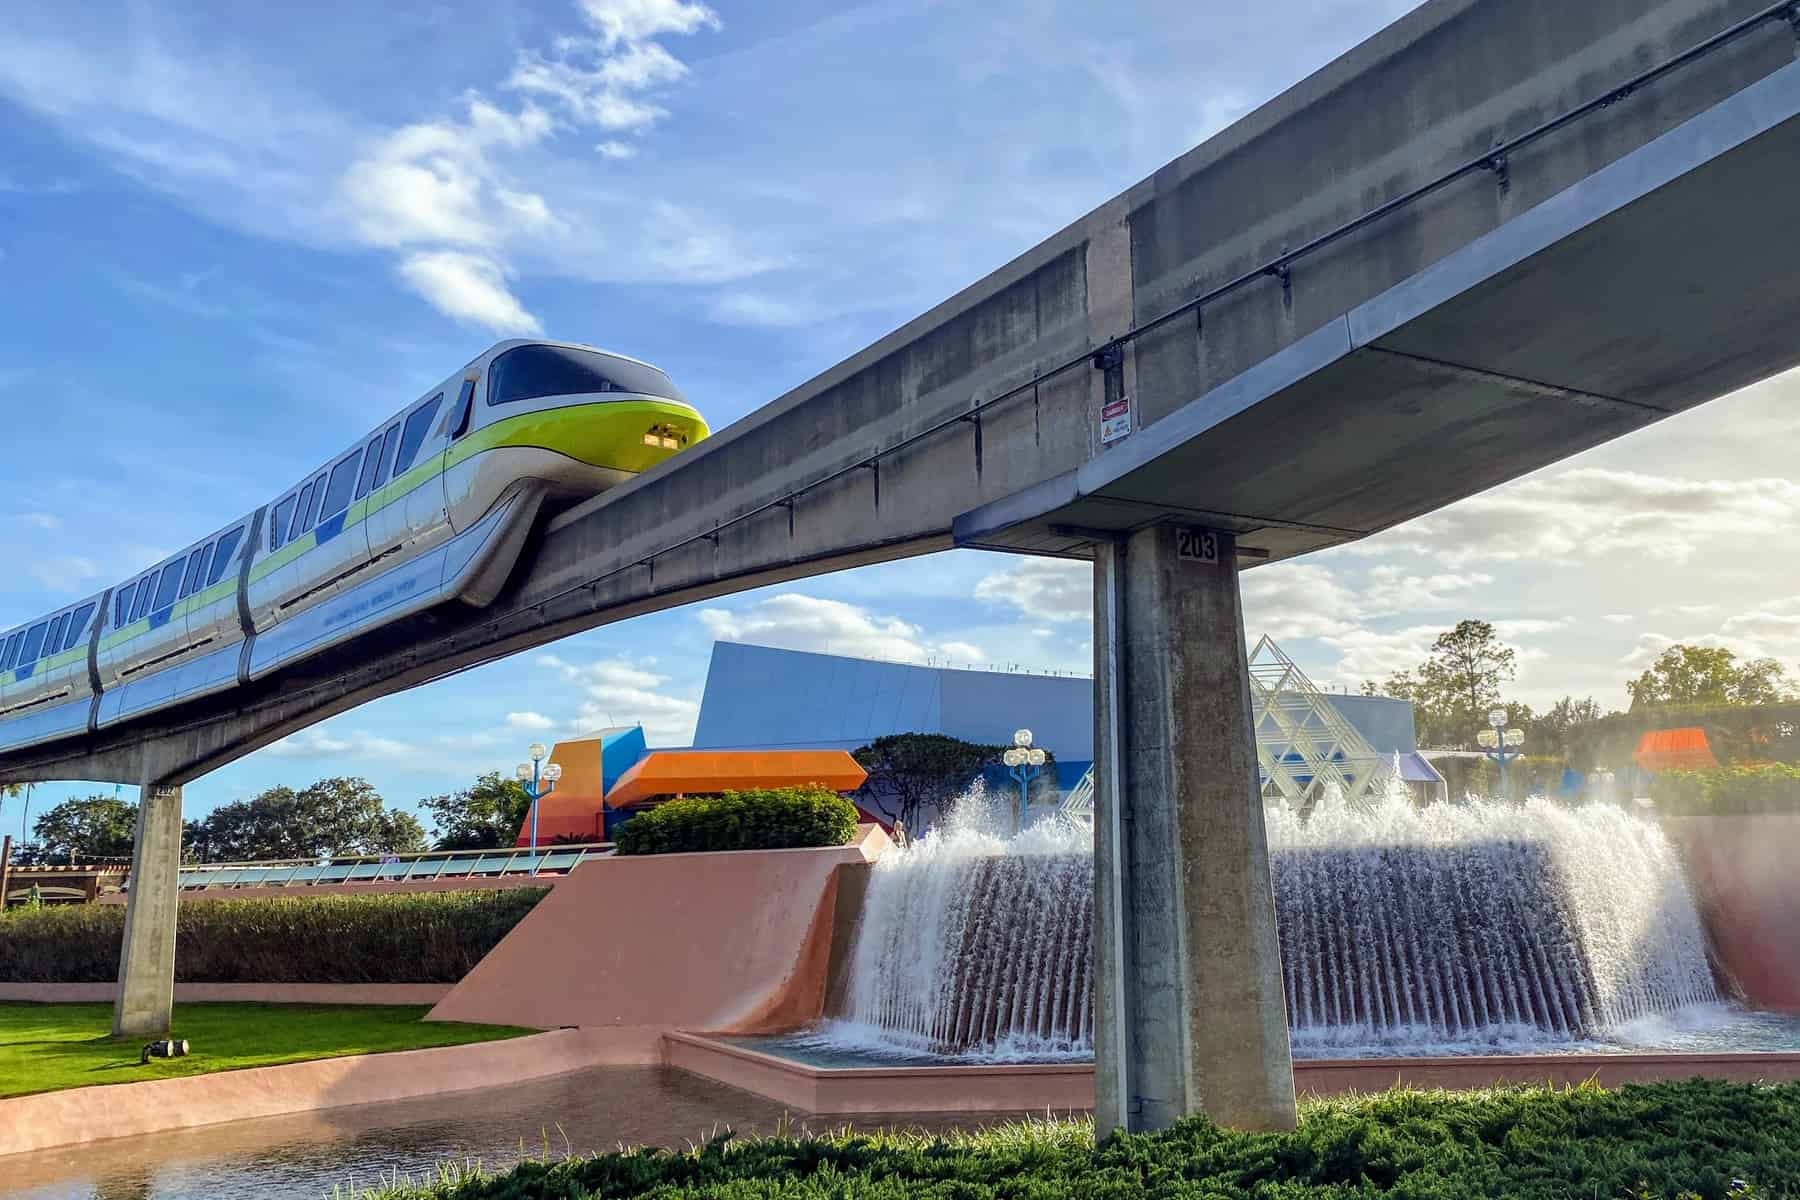 Monorail passing through Epcot